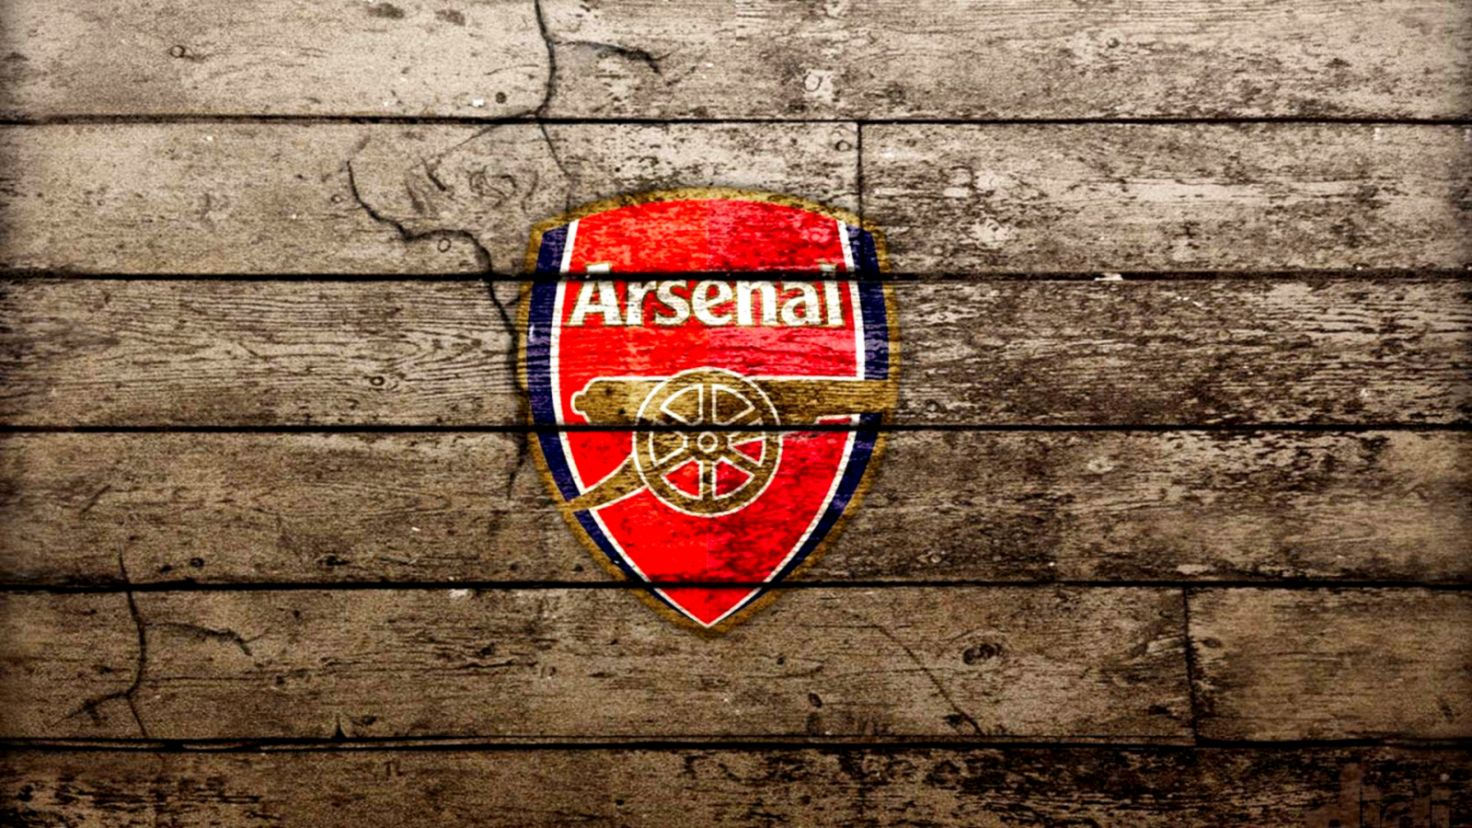 Arsenal Background Wallpaper Lib Wallpapers